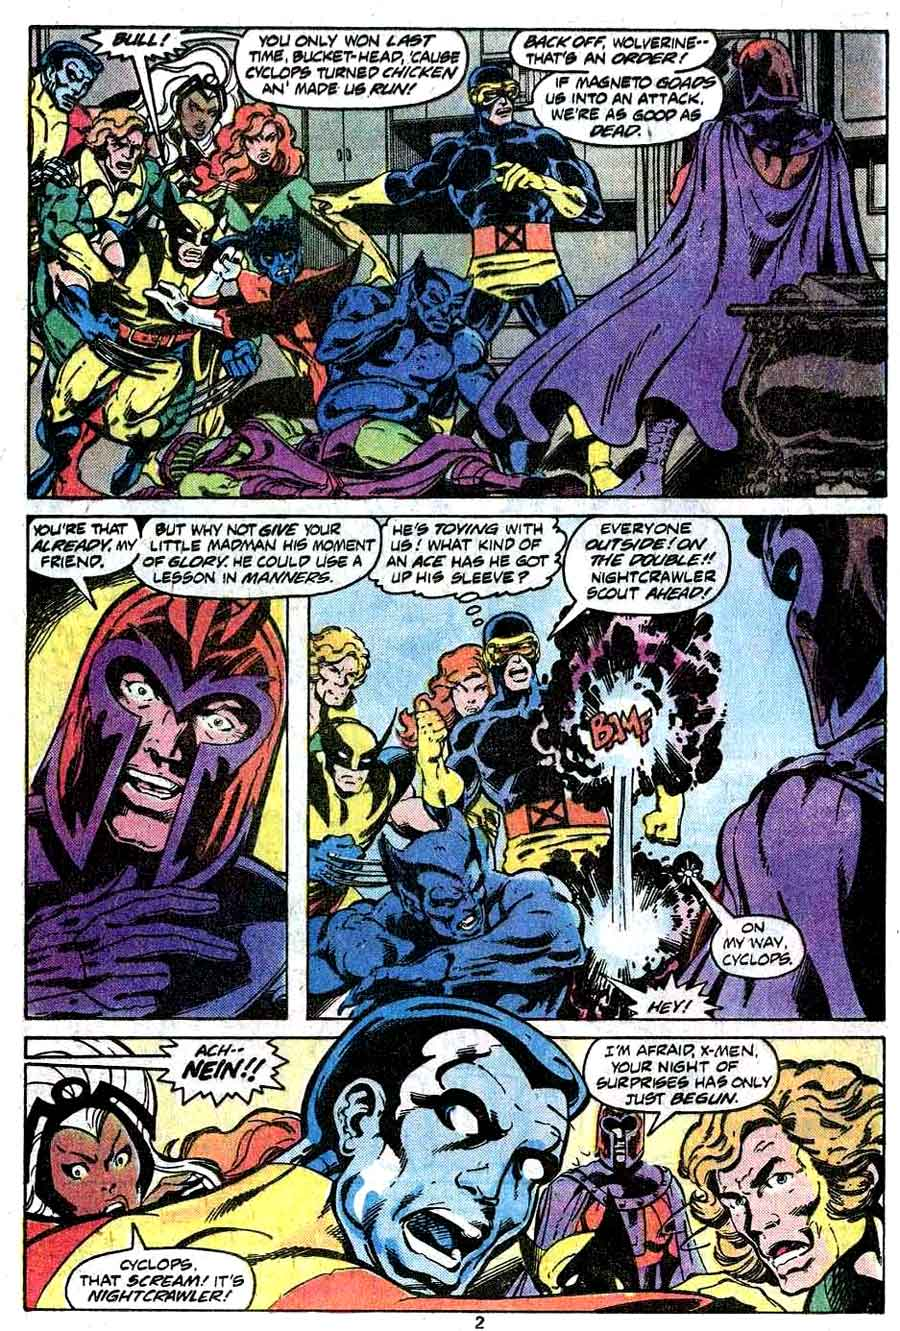 X-men v1 #112 marvel comic book page art by John Byrne